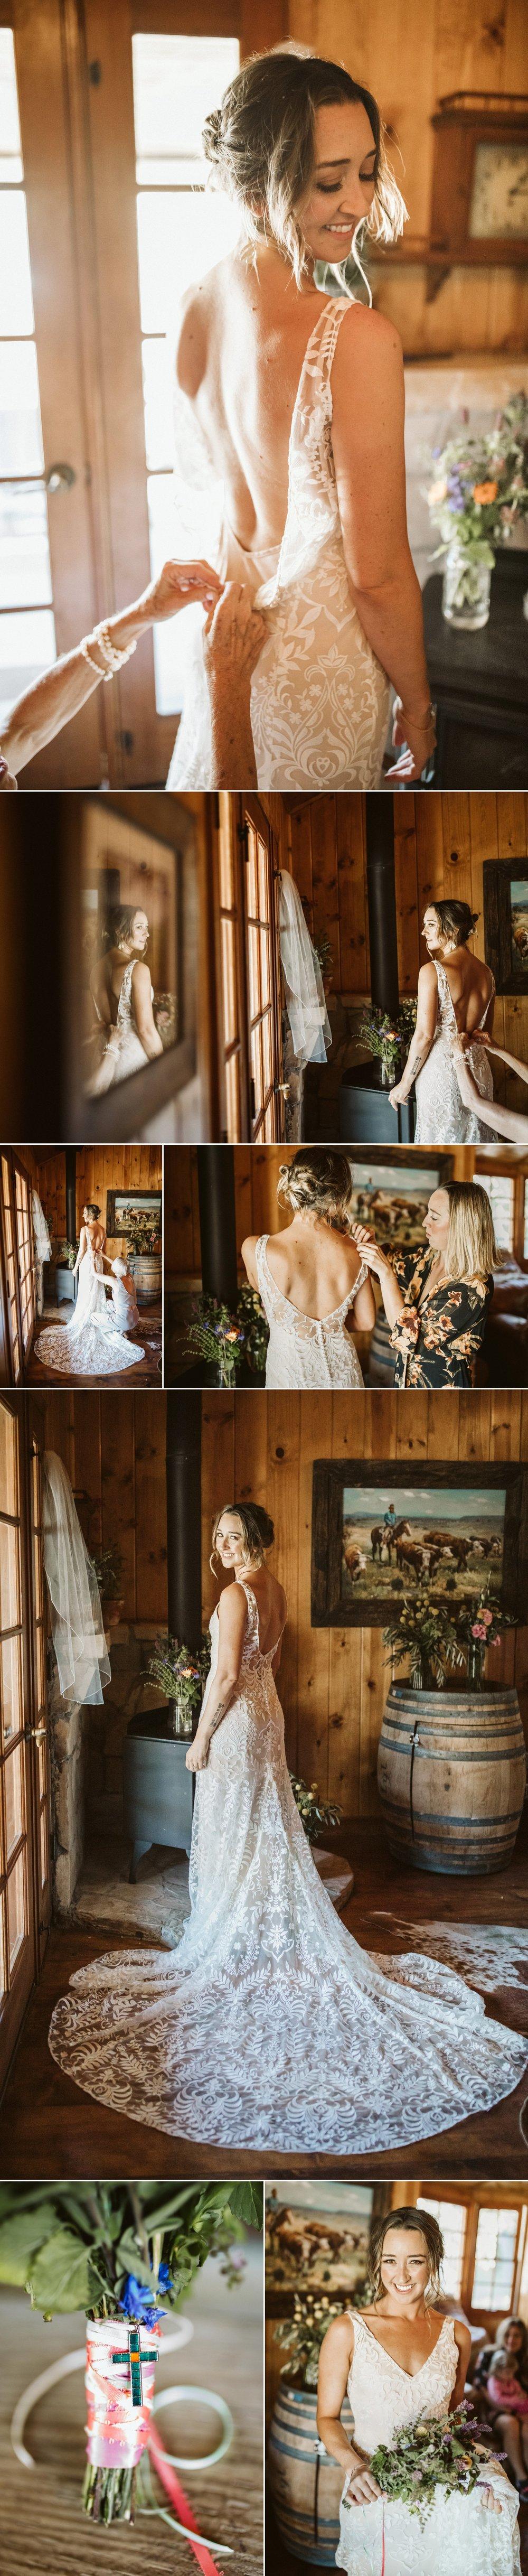 Colorful Barn Wedding at Jalama Canon Ranch- Lompoc- Santa Barbara- Geoff & Lauren 11.jpg